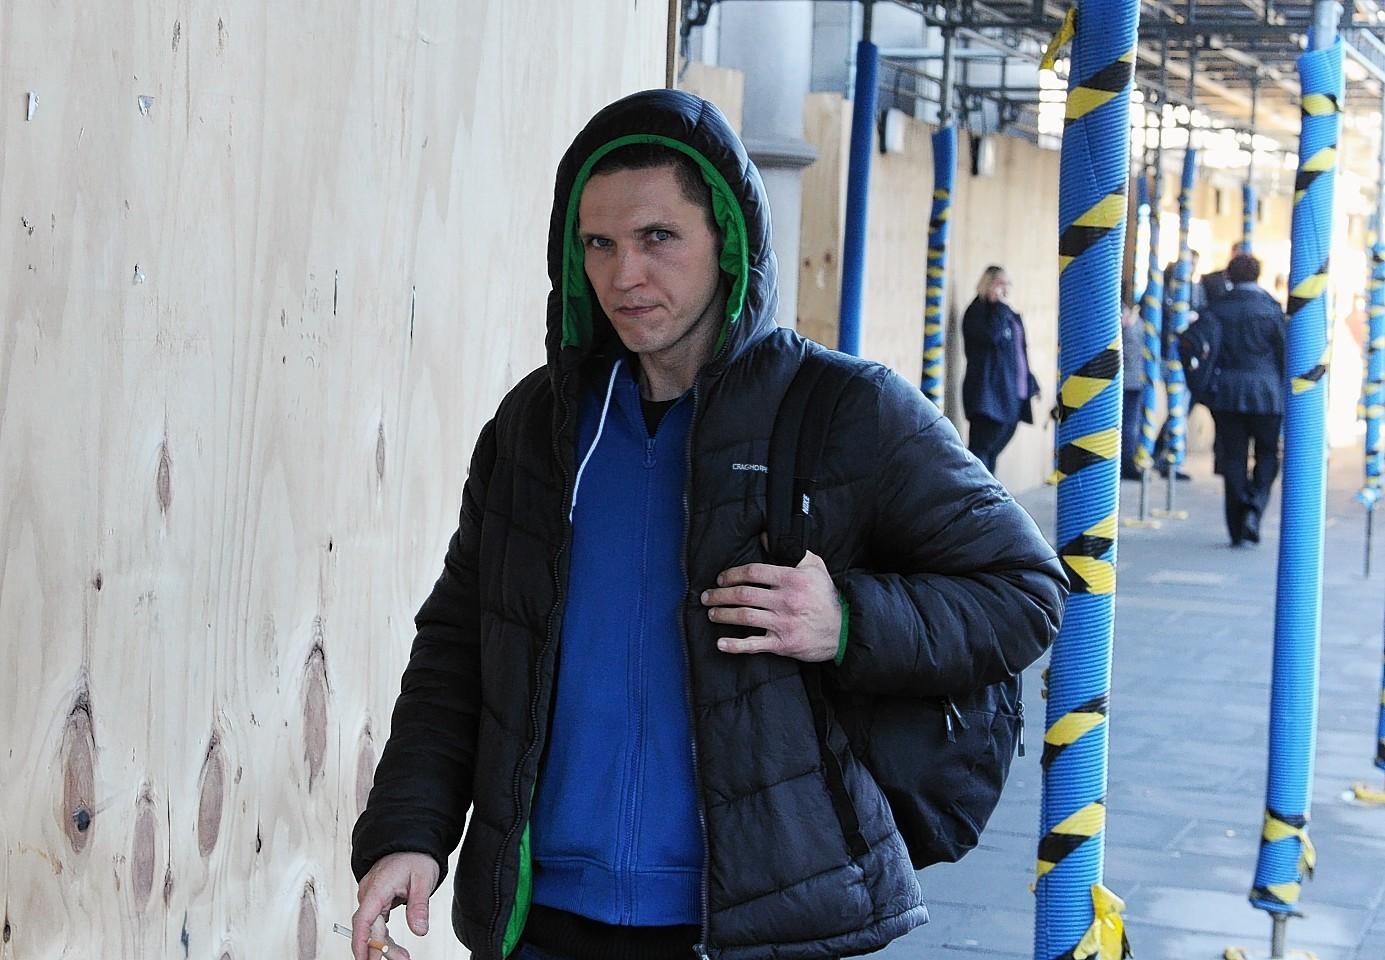 Daniel Koterbski, who tried to steal £20,000 of jewellery from Northern Diamond, Aberdeen